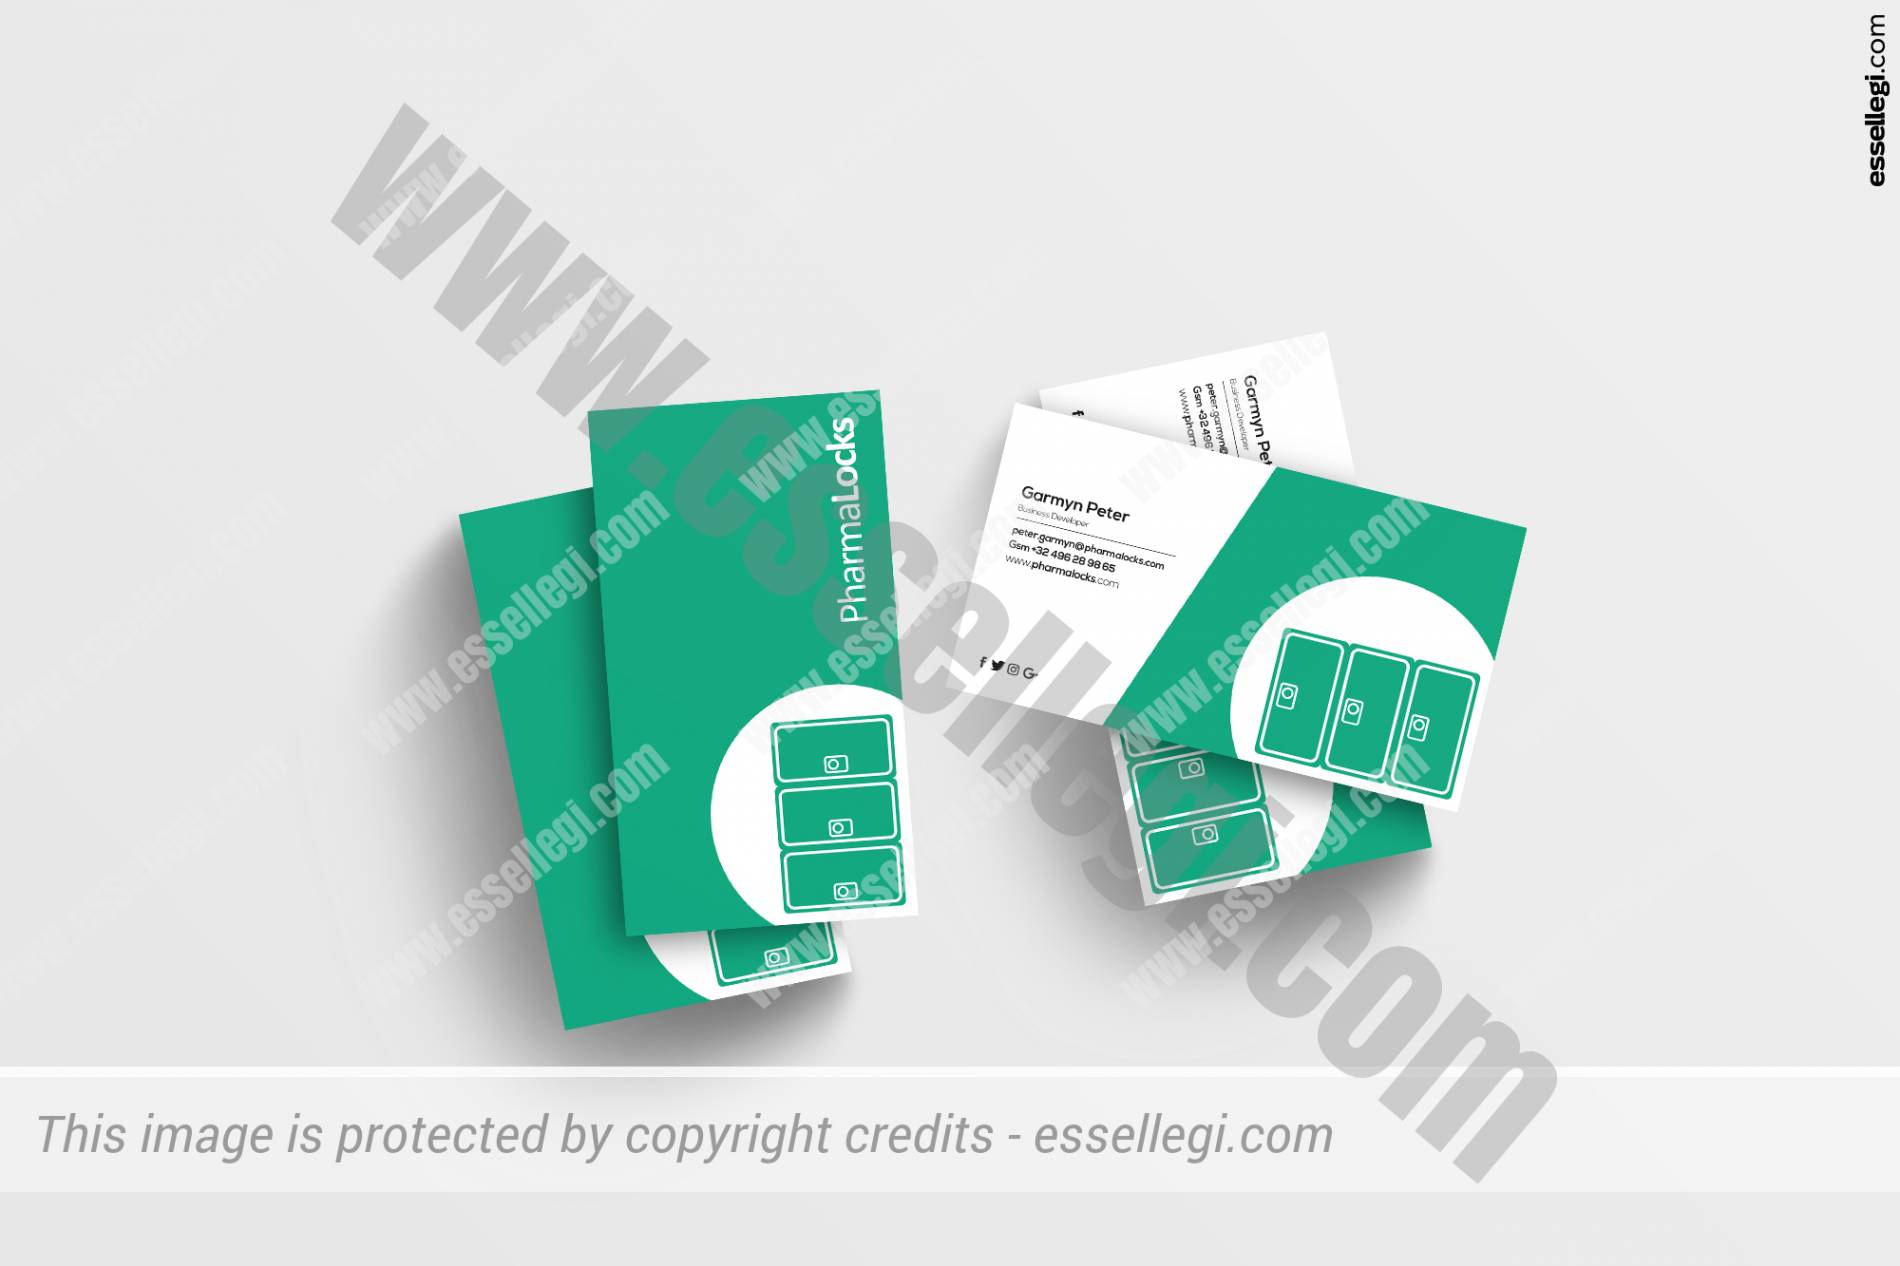 PharmaLocks Business Card Design by Essellegi Design